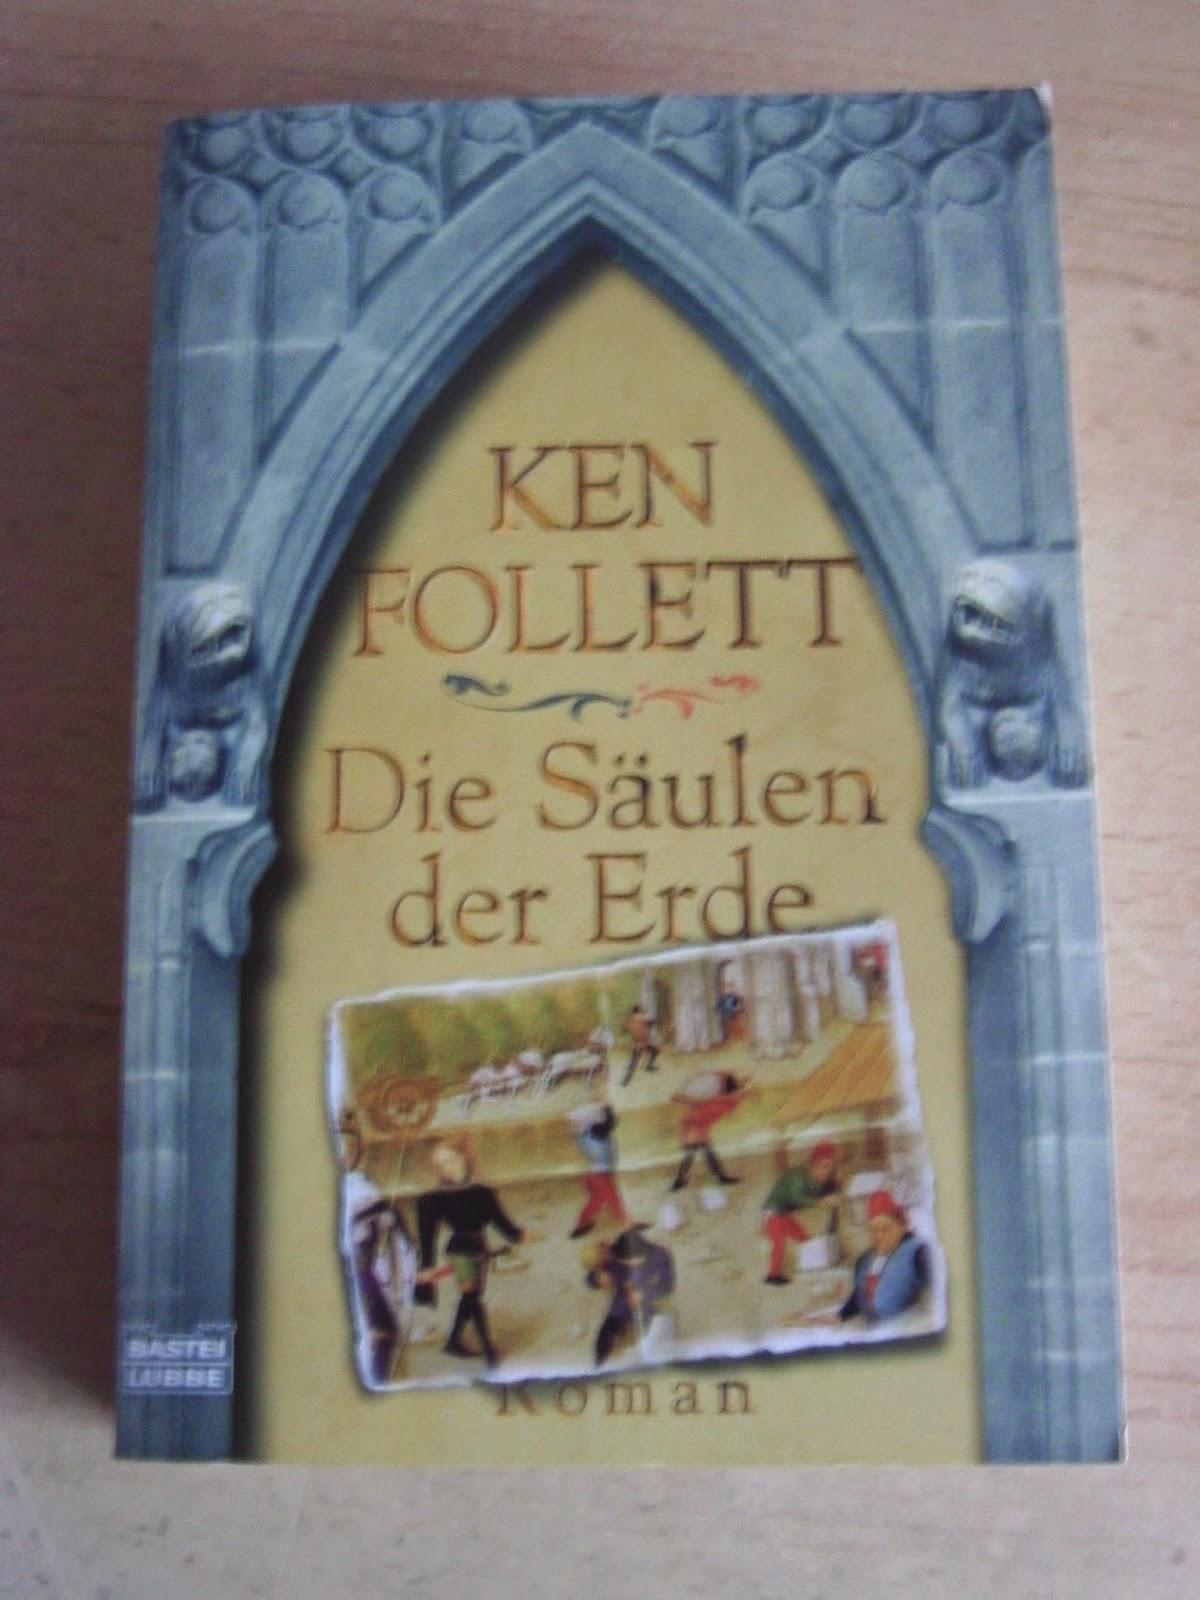 http://www.amazon.de/Die-S%C3%A4ulen-Erde-Ken-Follett/dp/3404118960/ref=sr_1_1?s=books&ie=UTF8&qid=1424981868&sr=1-1&keywords=die+s%C3%A4ulen+der+erde